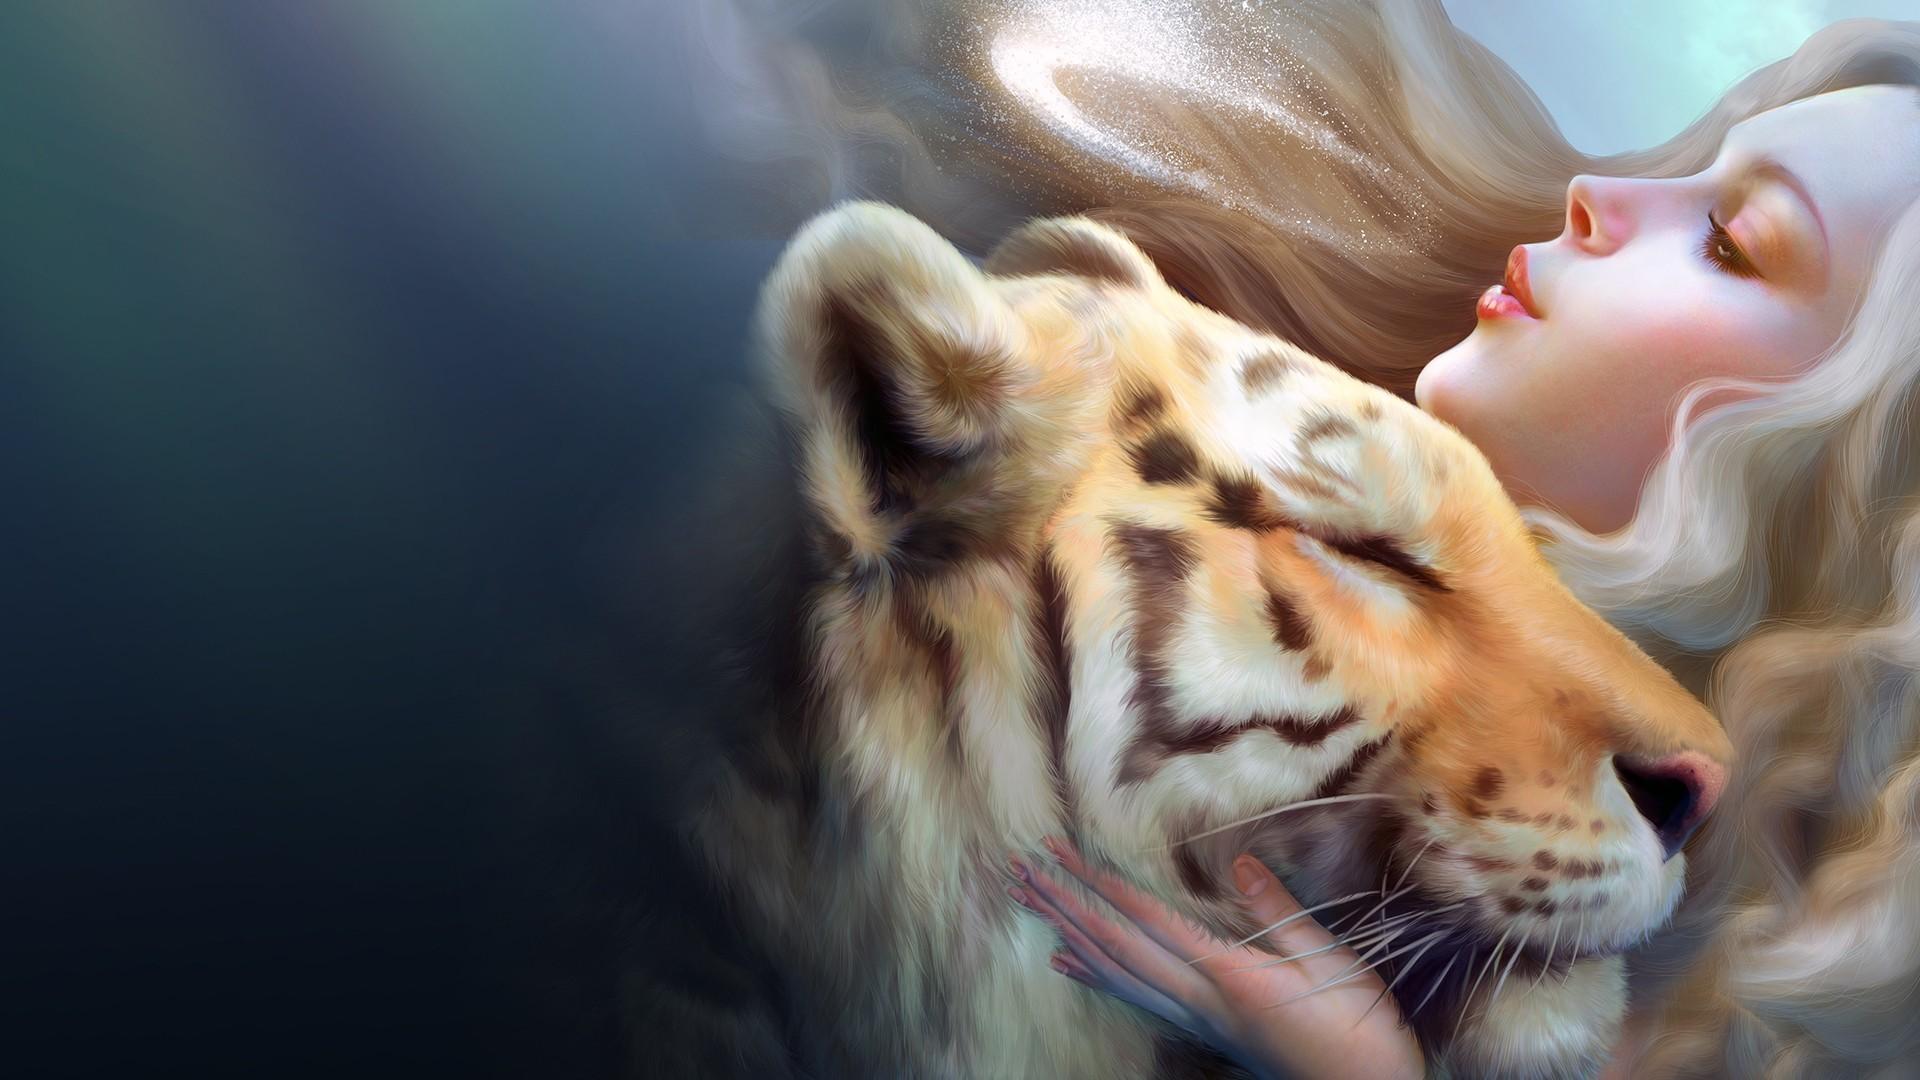 tiger wallpaper girl cute